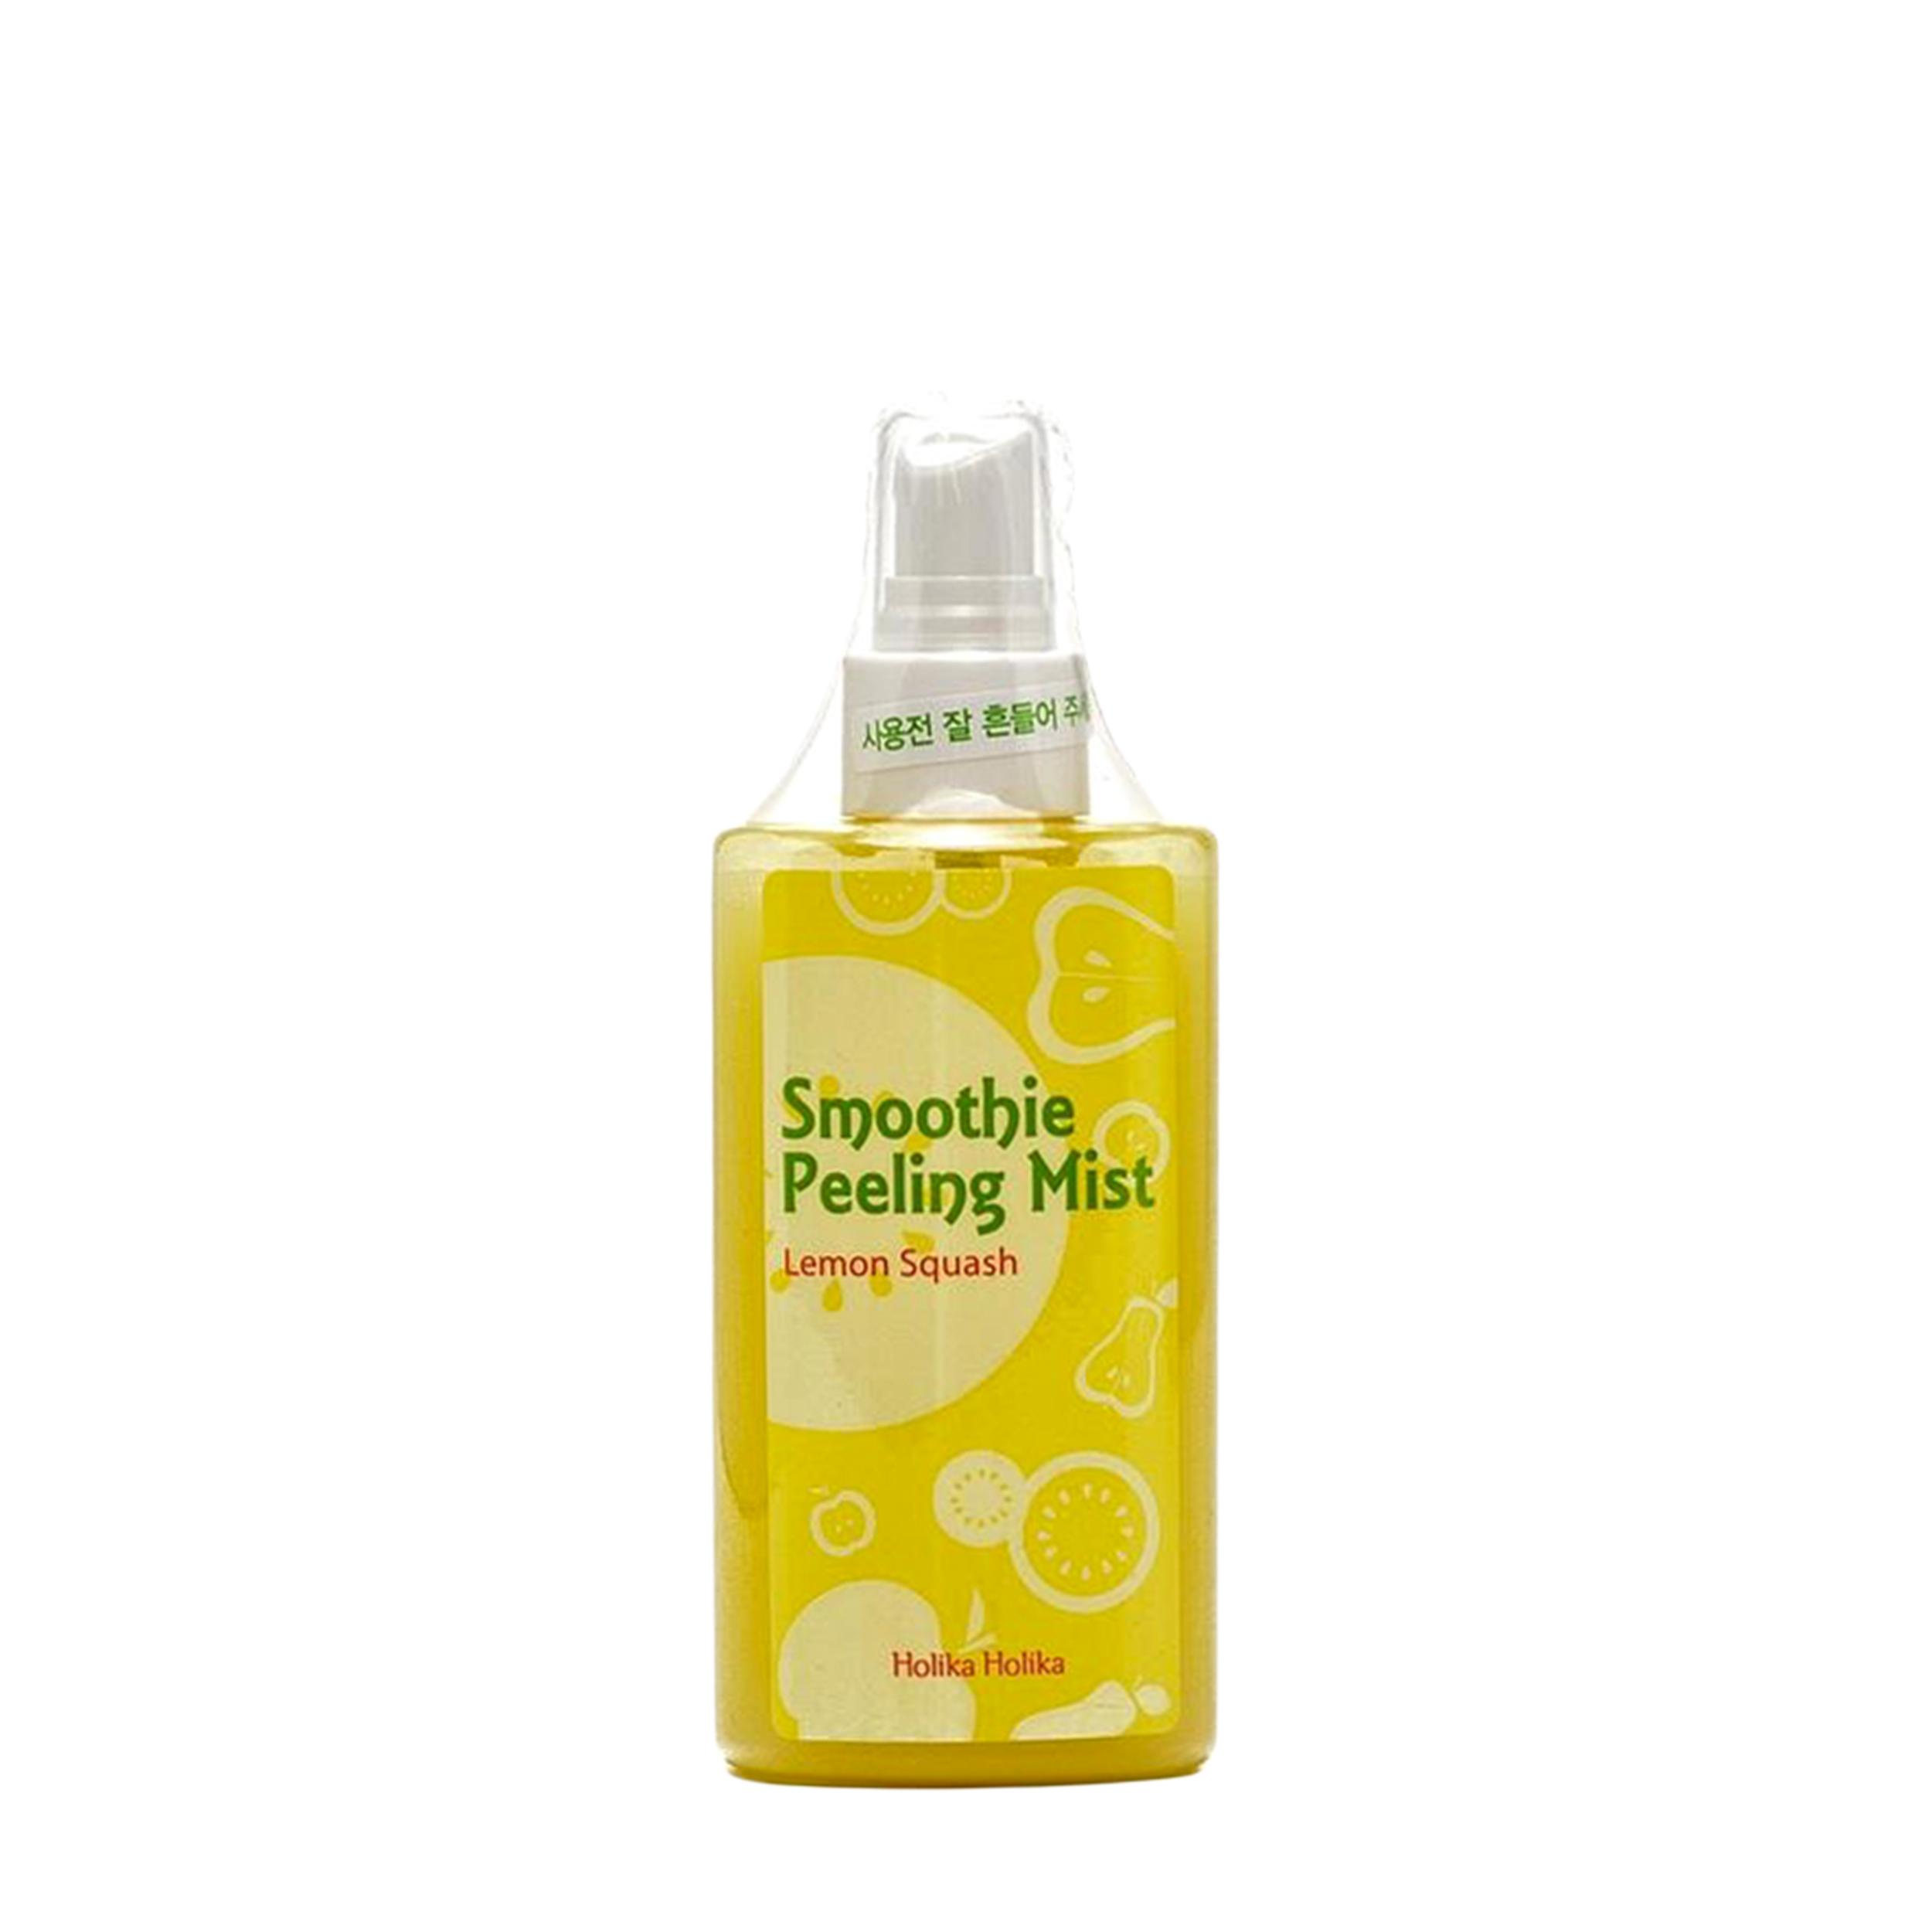 Купить Holika Holika Отшелушивающий мист-скатка «Smoothie Peeling» 150 мл